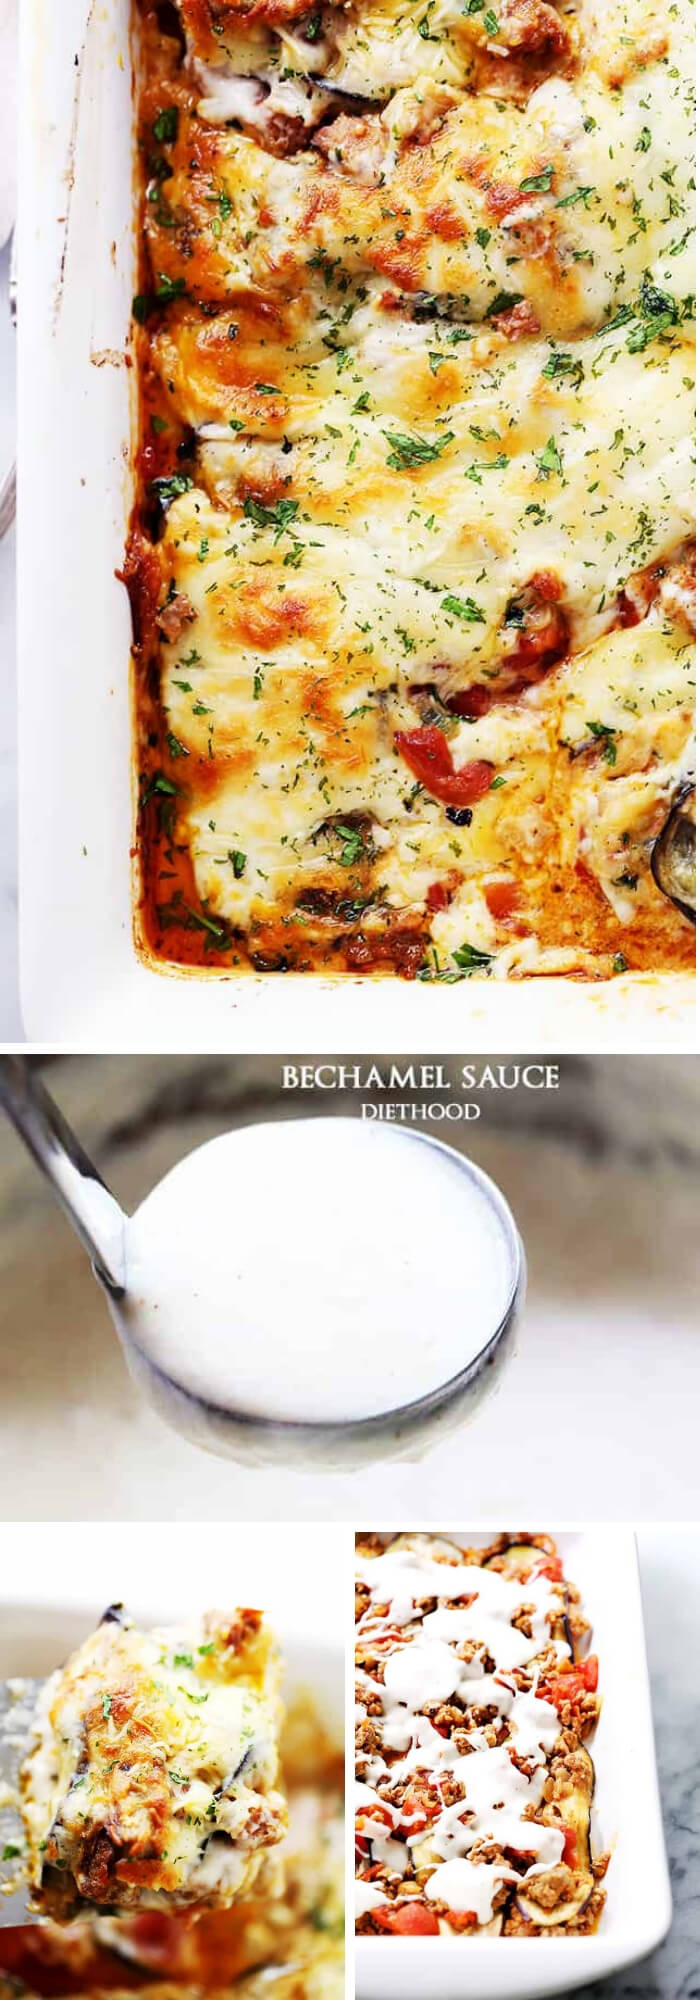 Sausage and Eggplant Casserole | Nutritious Keto & Low Carb Casserole Recipes | heall